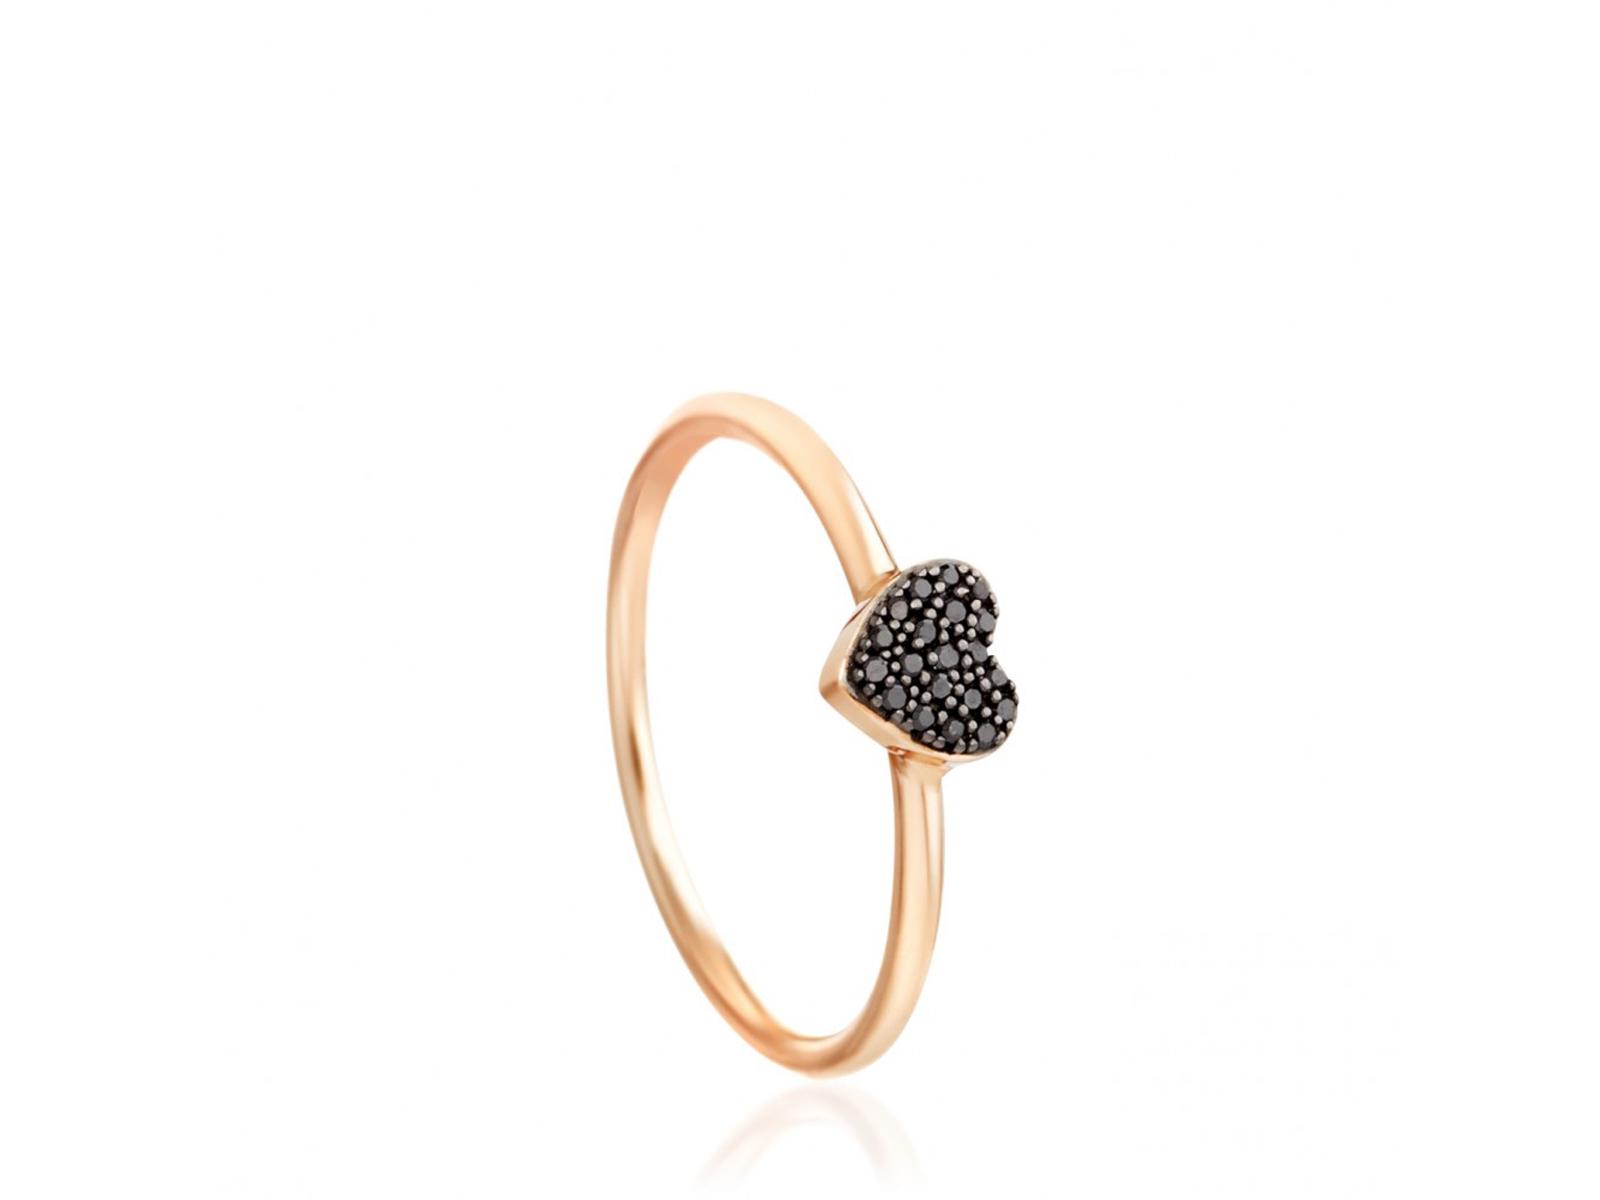 14k gold black diamond heart ring by astley clarke. Black Bedroom Furniture Sets. Home Design Ideas